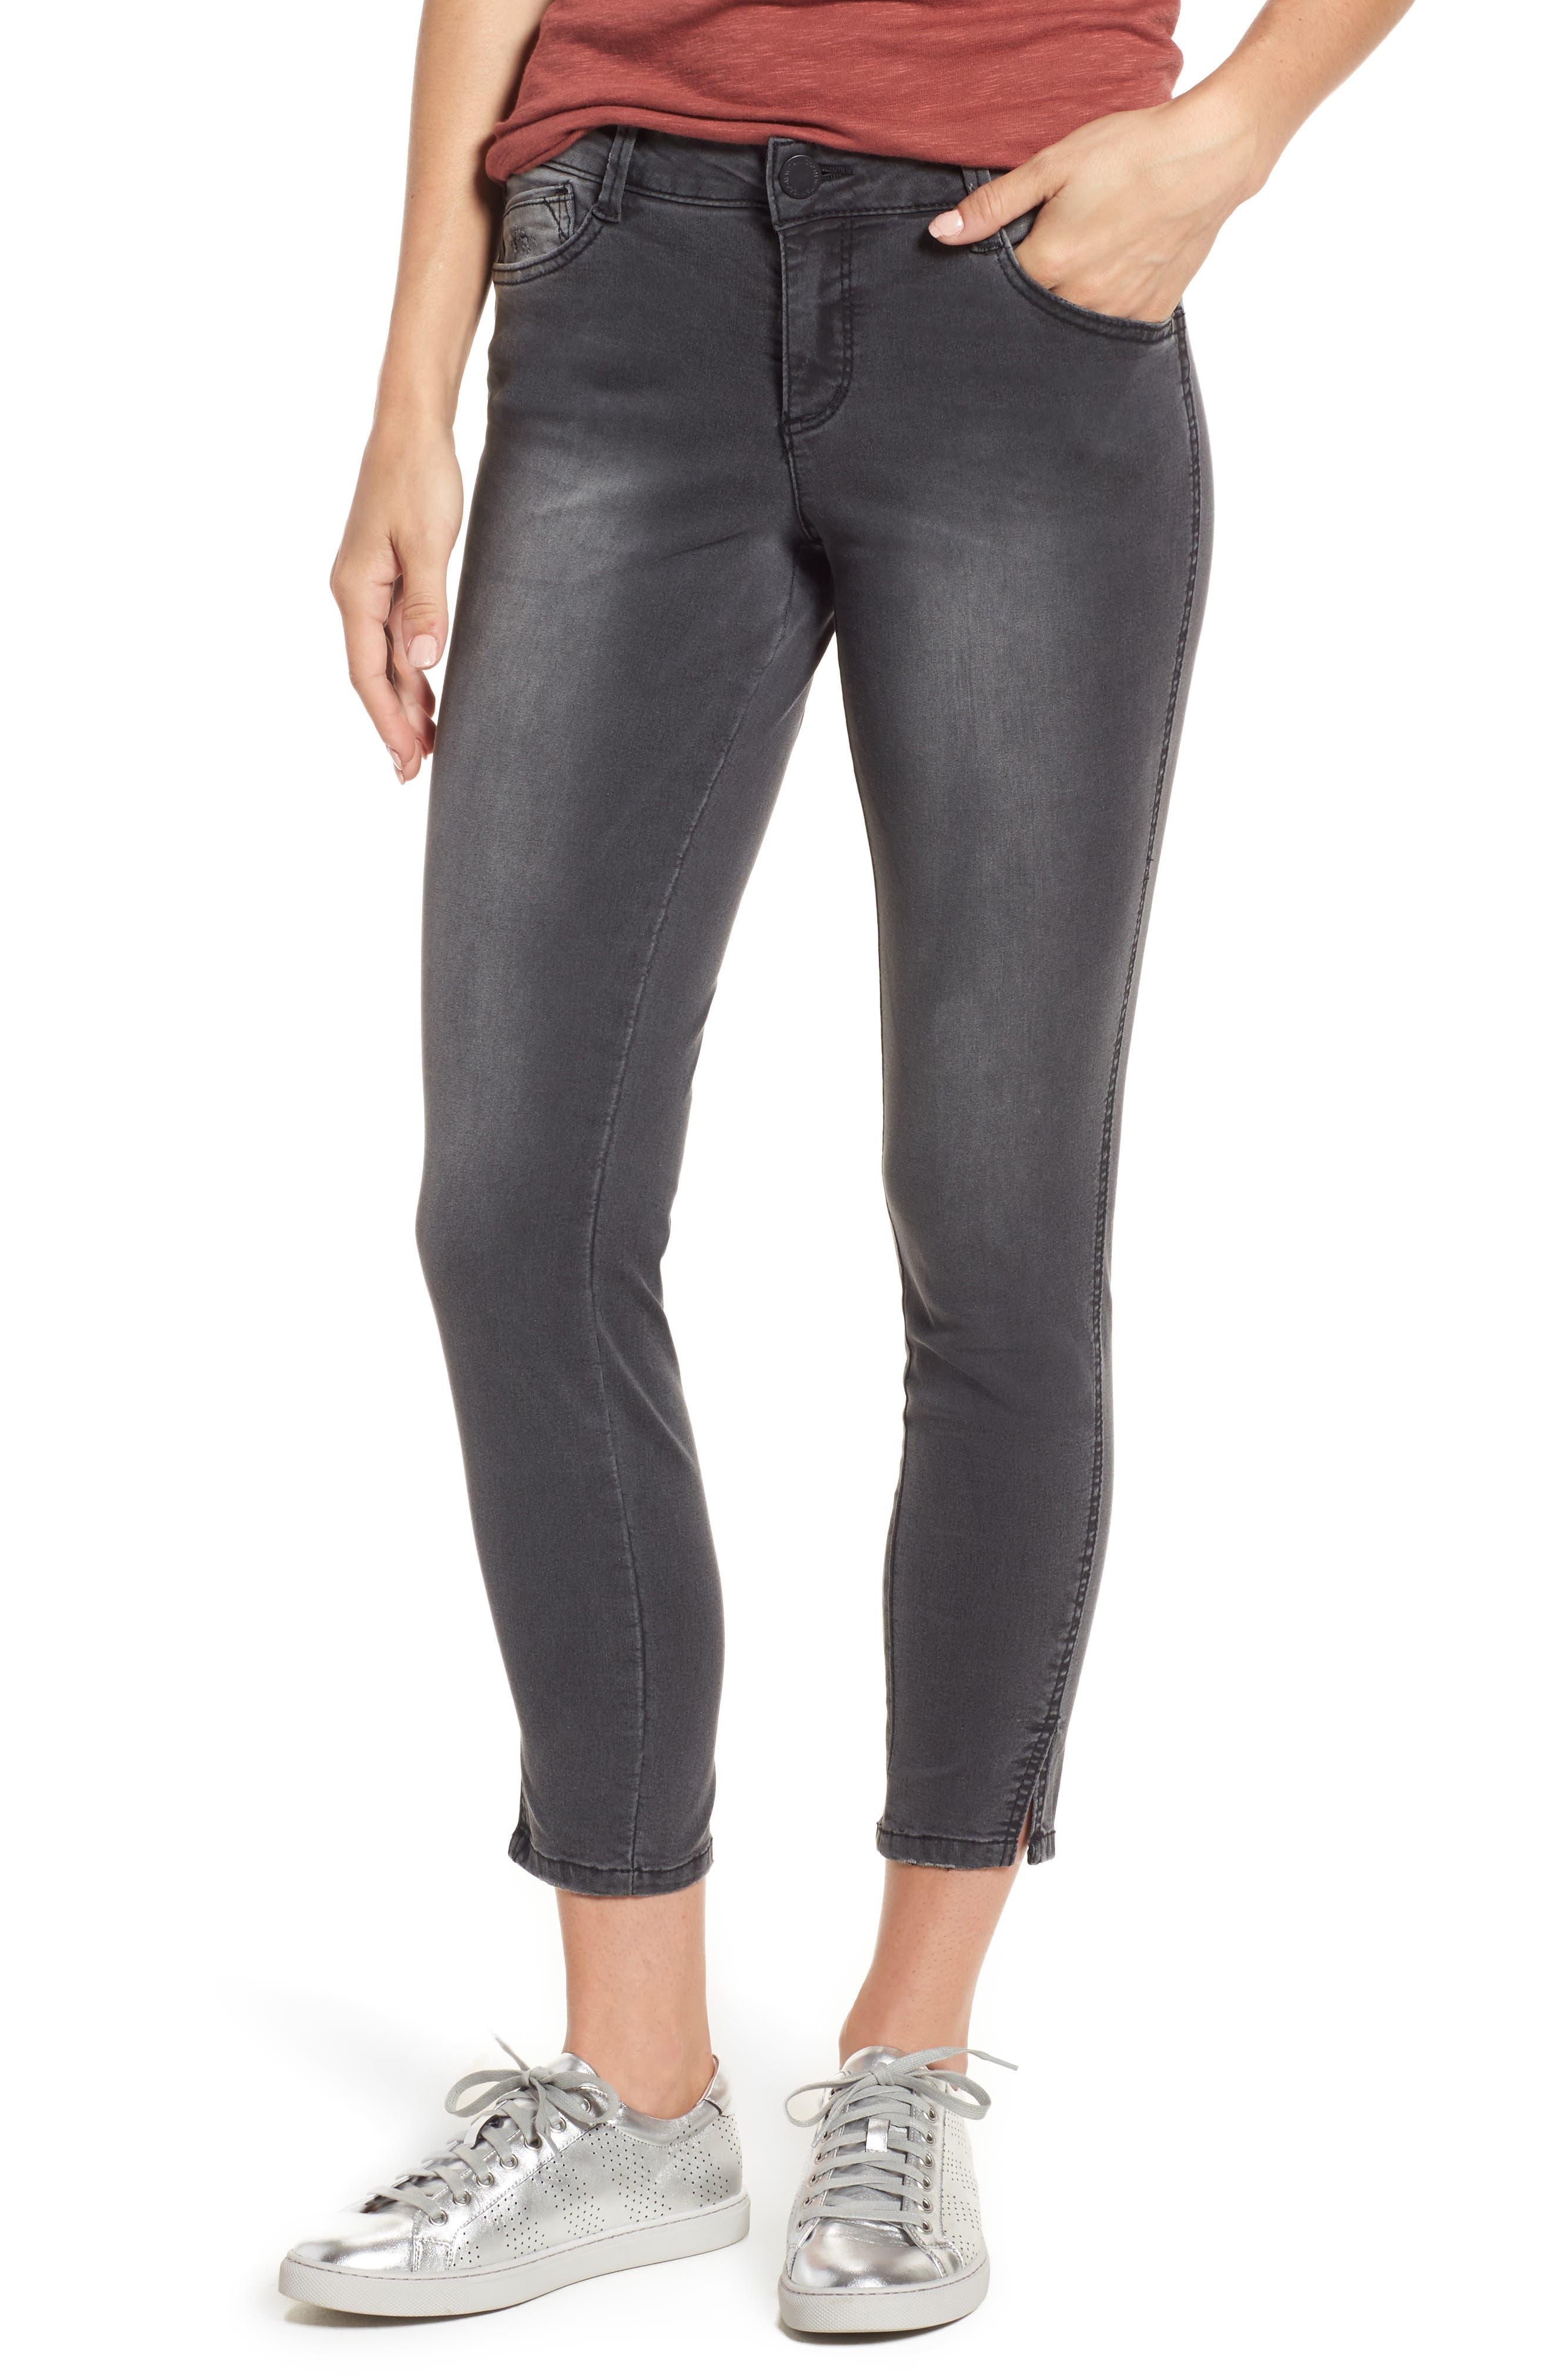 Wit & Wisdom Slit Skinny Ankle Jeans (Nordstrom Exclusive) (Regular & Petite)